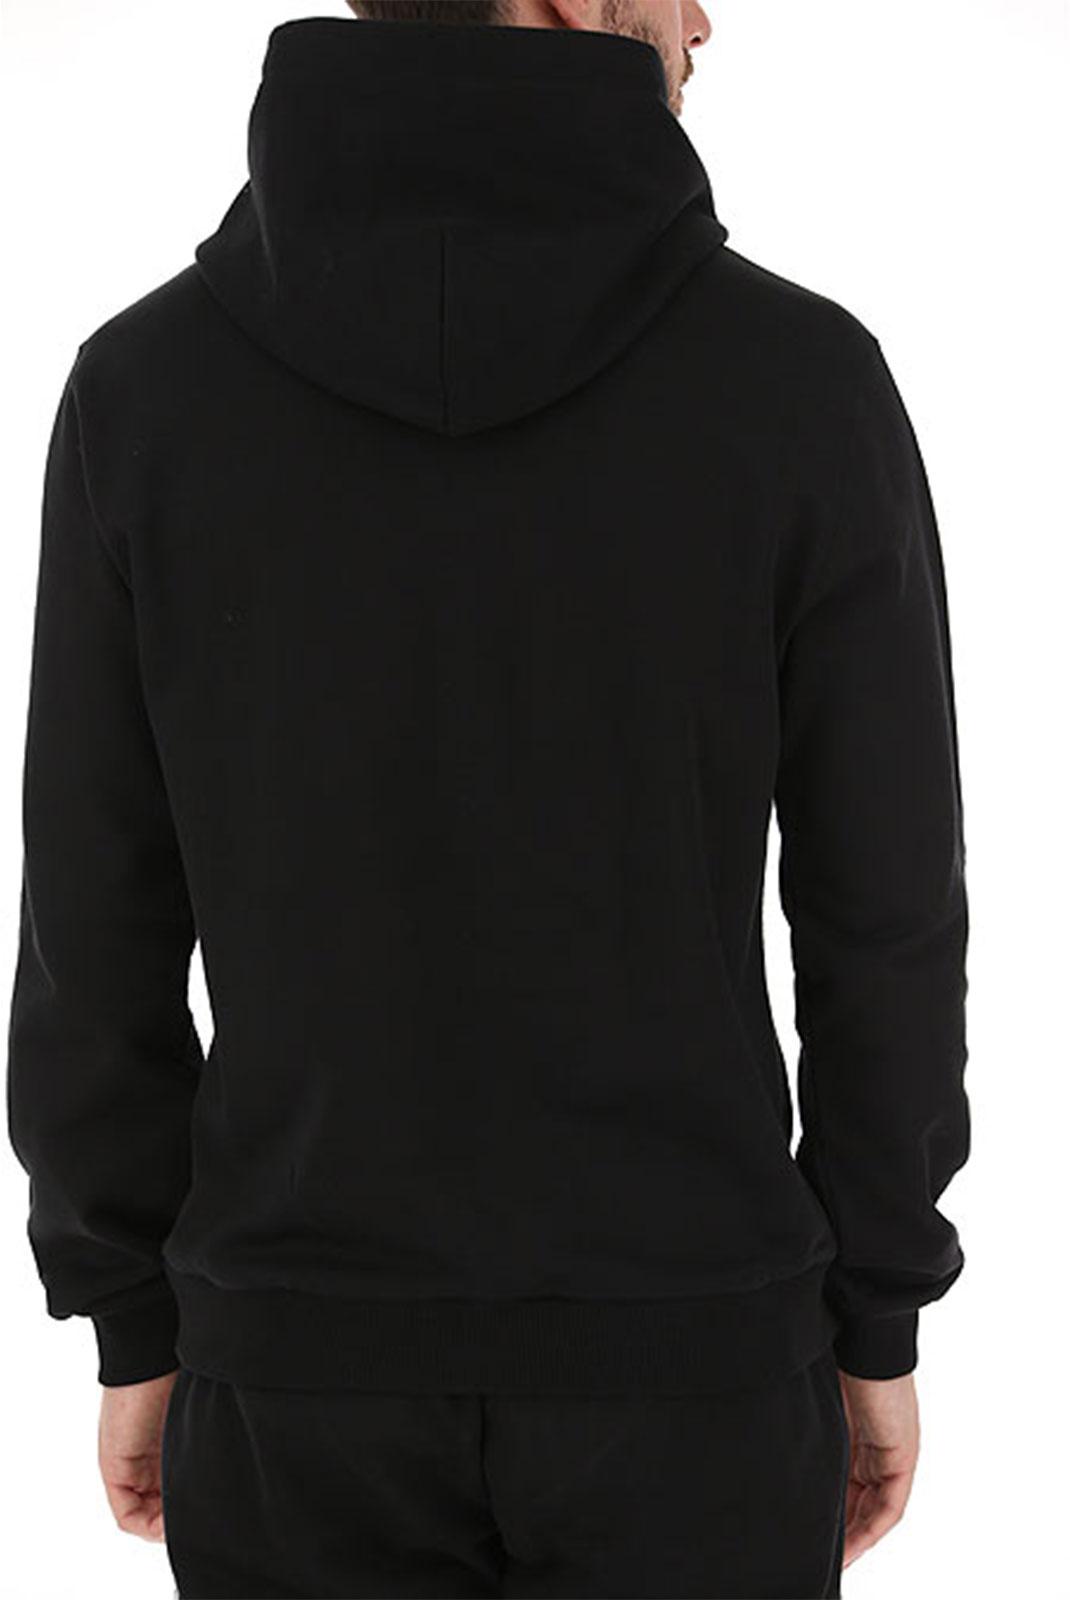 Sweatshirts  Dolce&Gabbana G9OV2Z N0000 BLACK